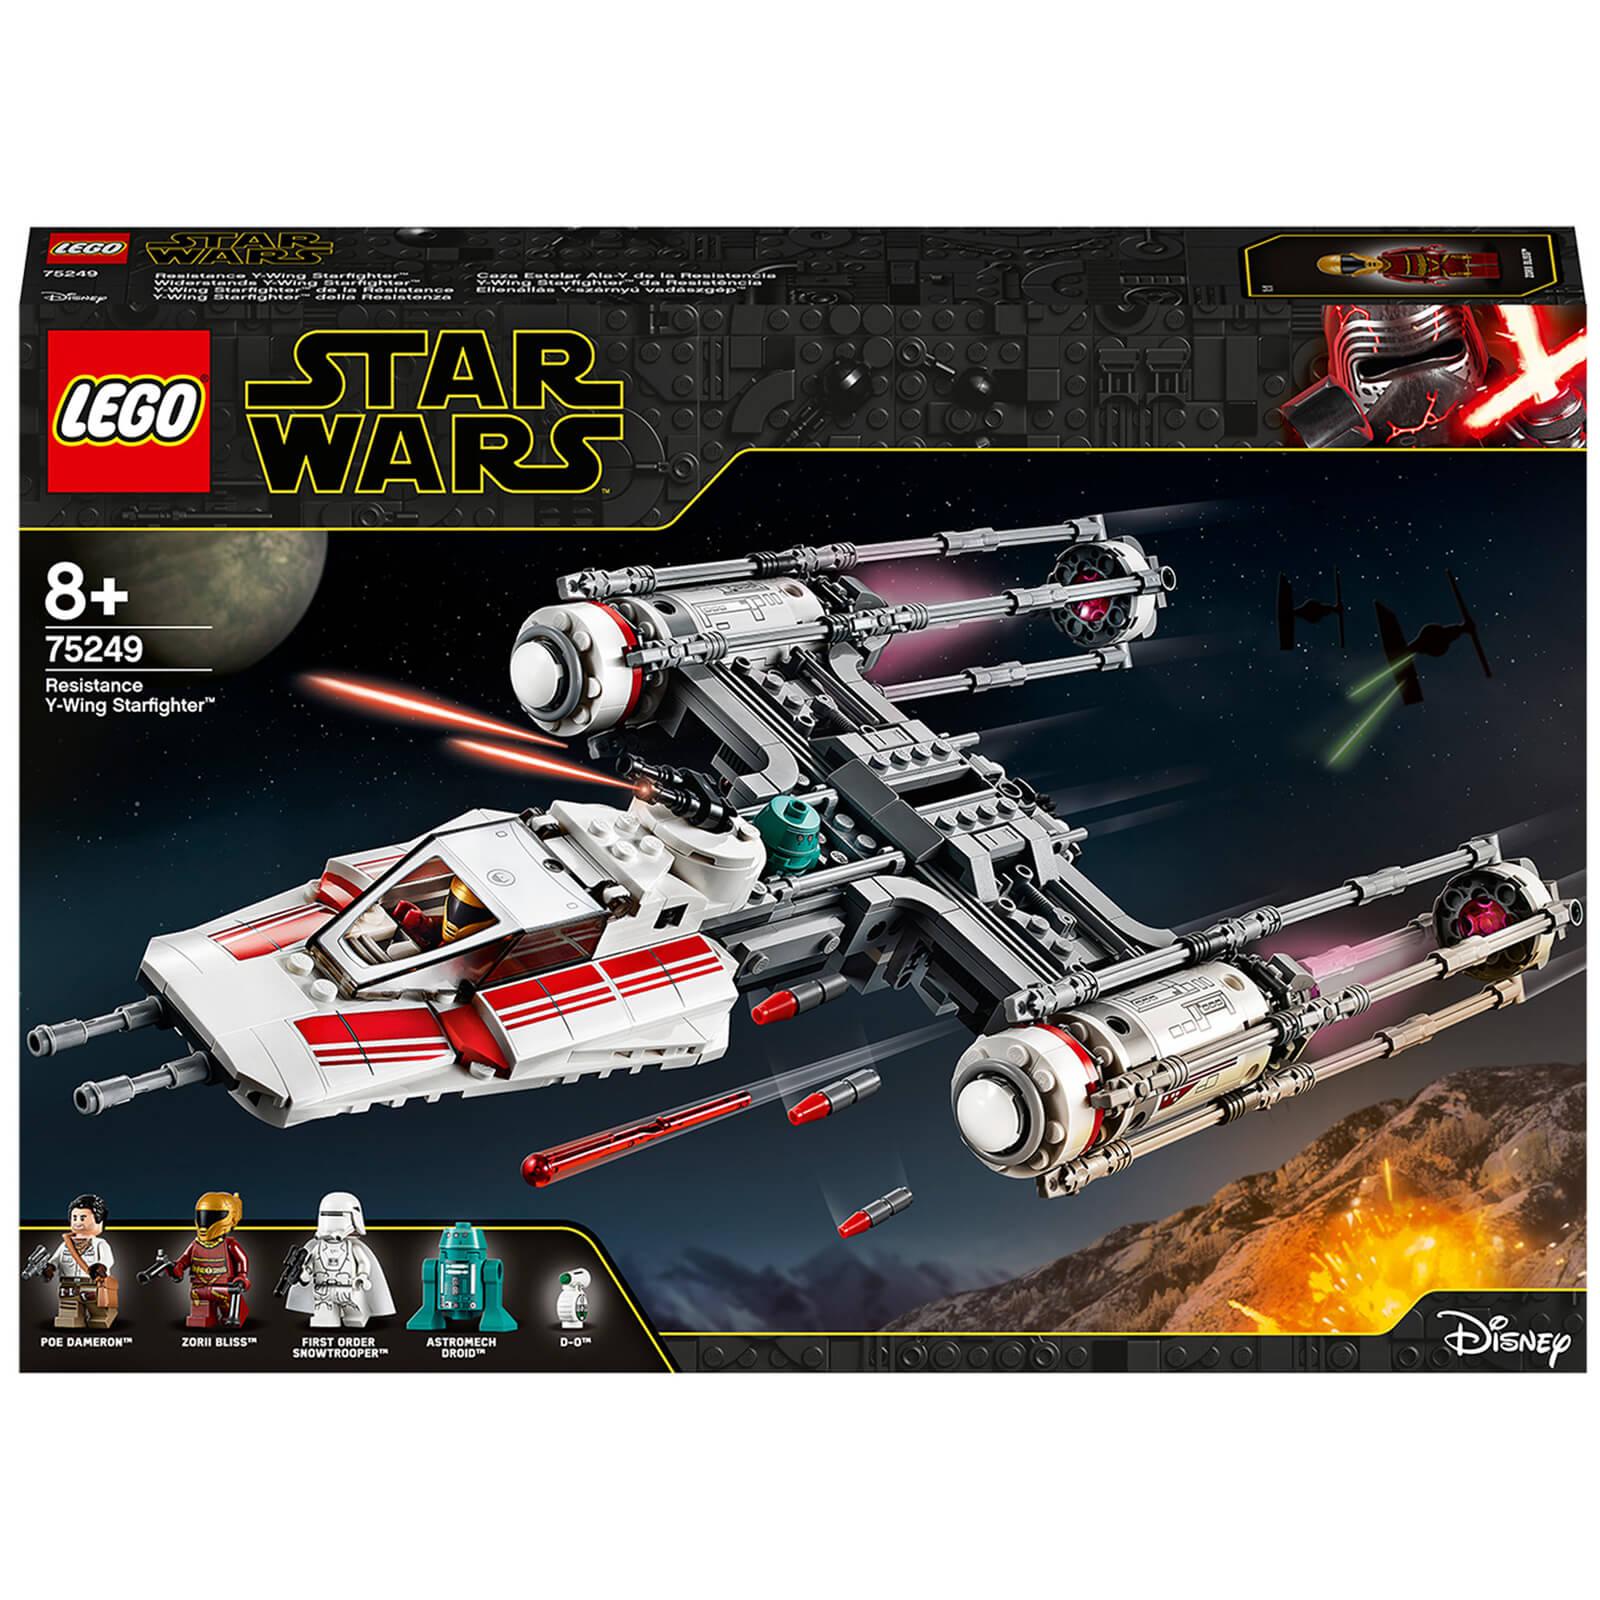 LEGO Star Wars: Resistance Y-Wing Starfighter Set (75249)